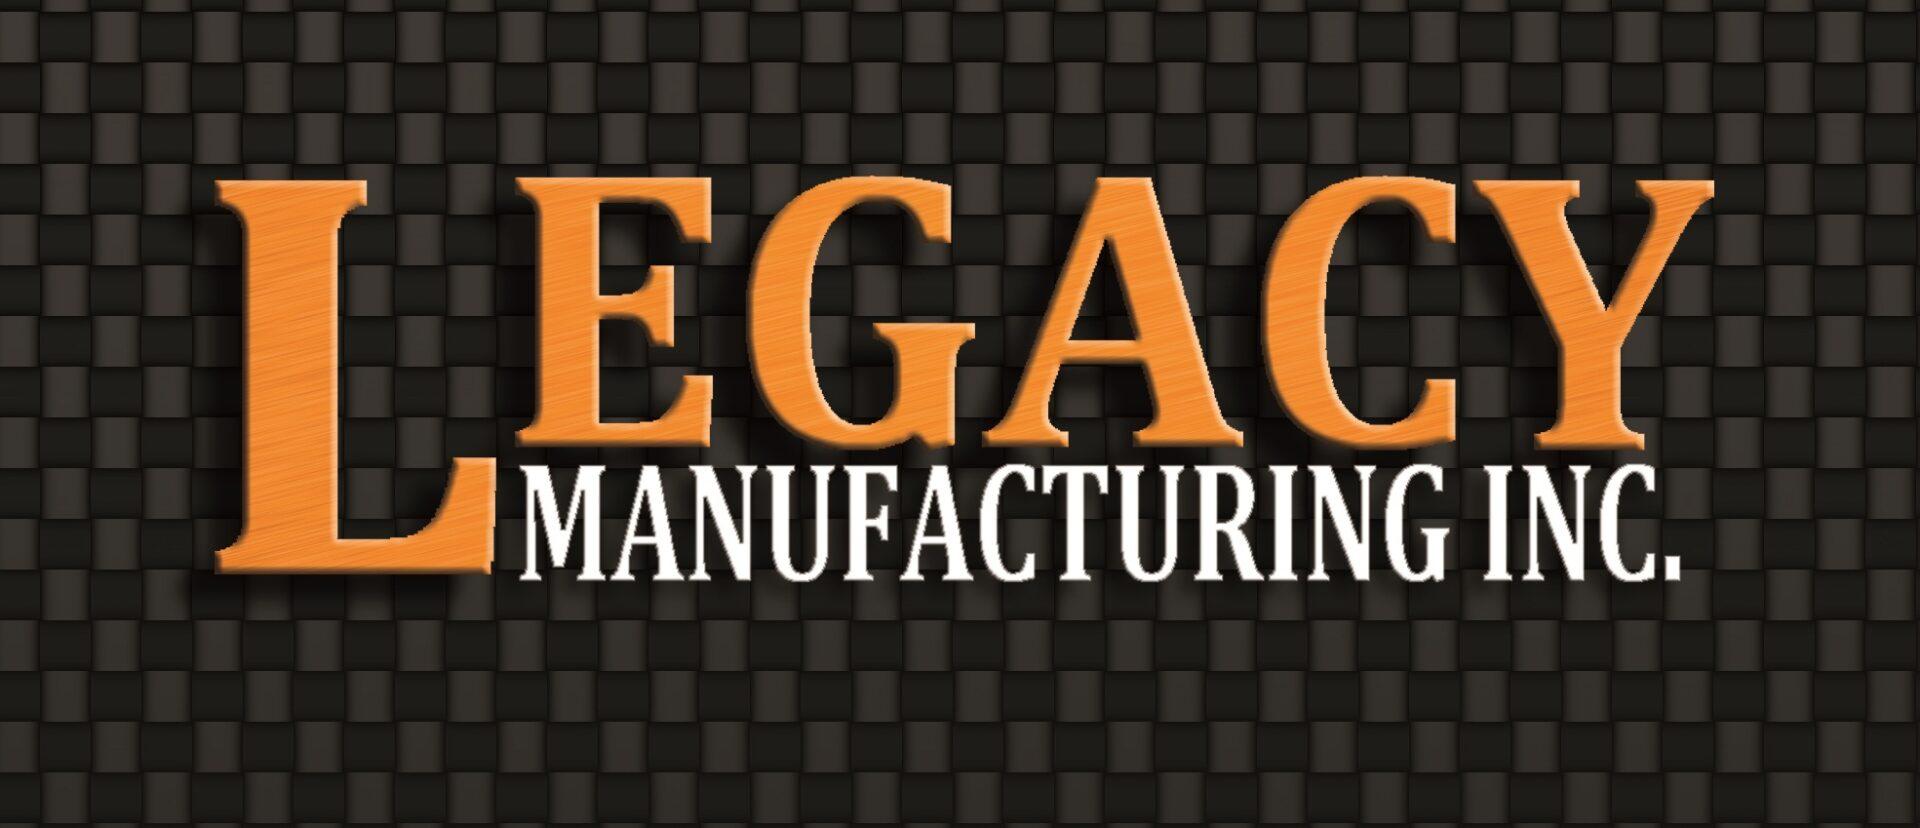 Legacy Manufacturer, Inc.